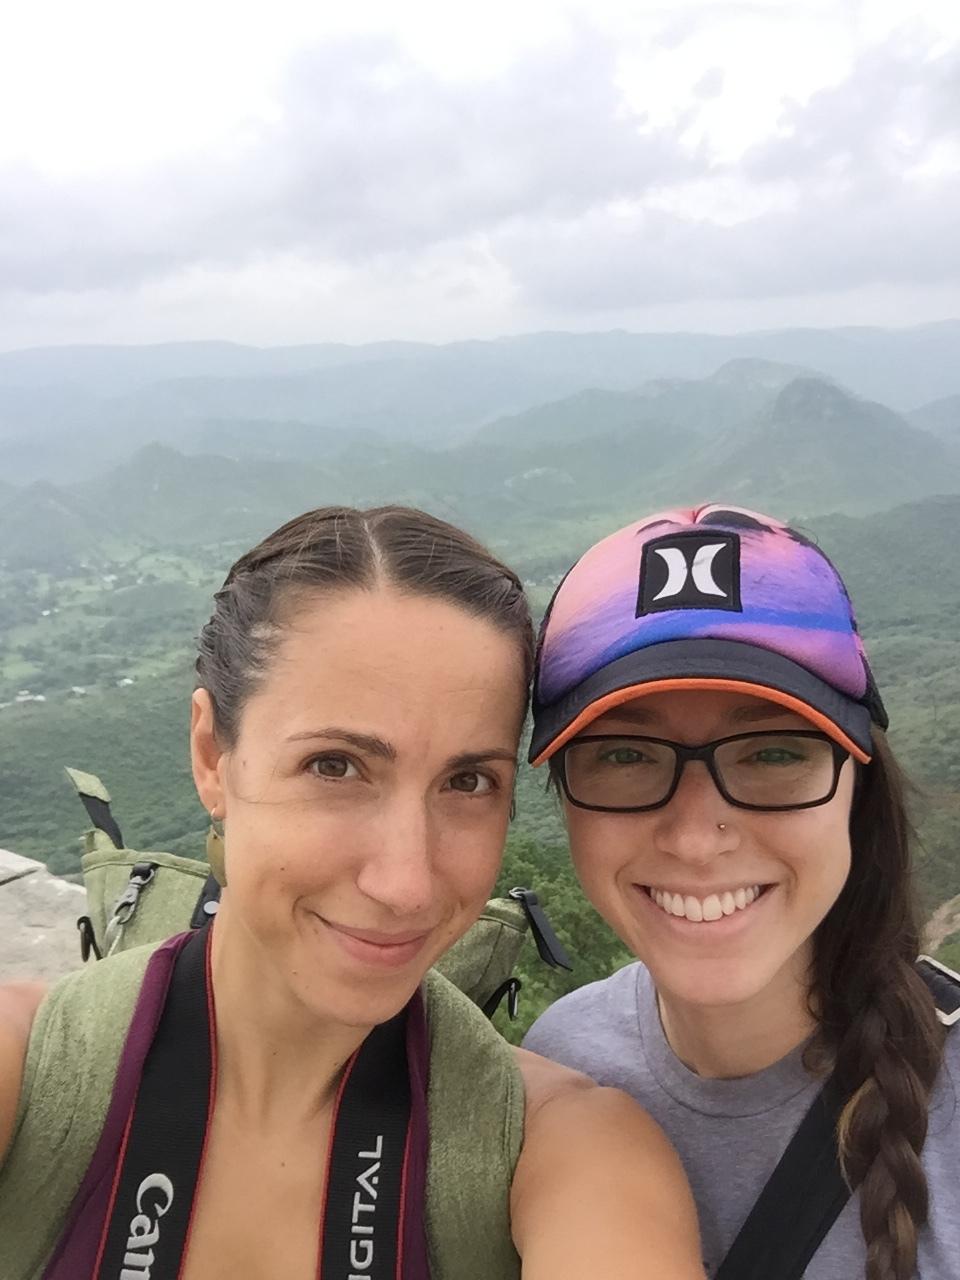 Ann and Alisha at the Top of Monsoon Palace